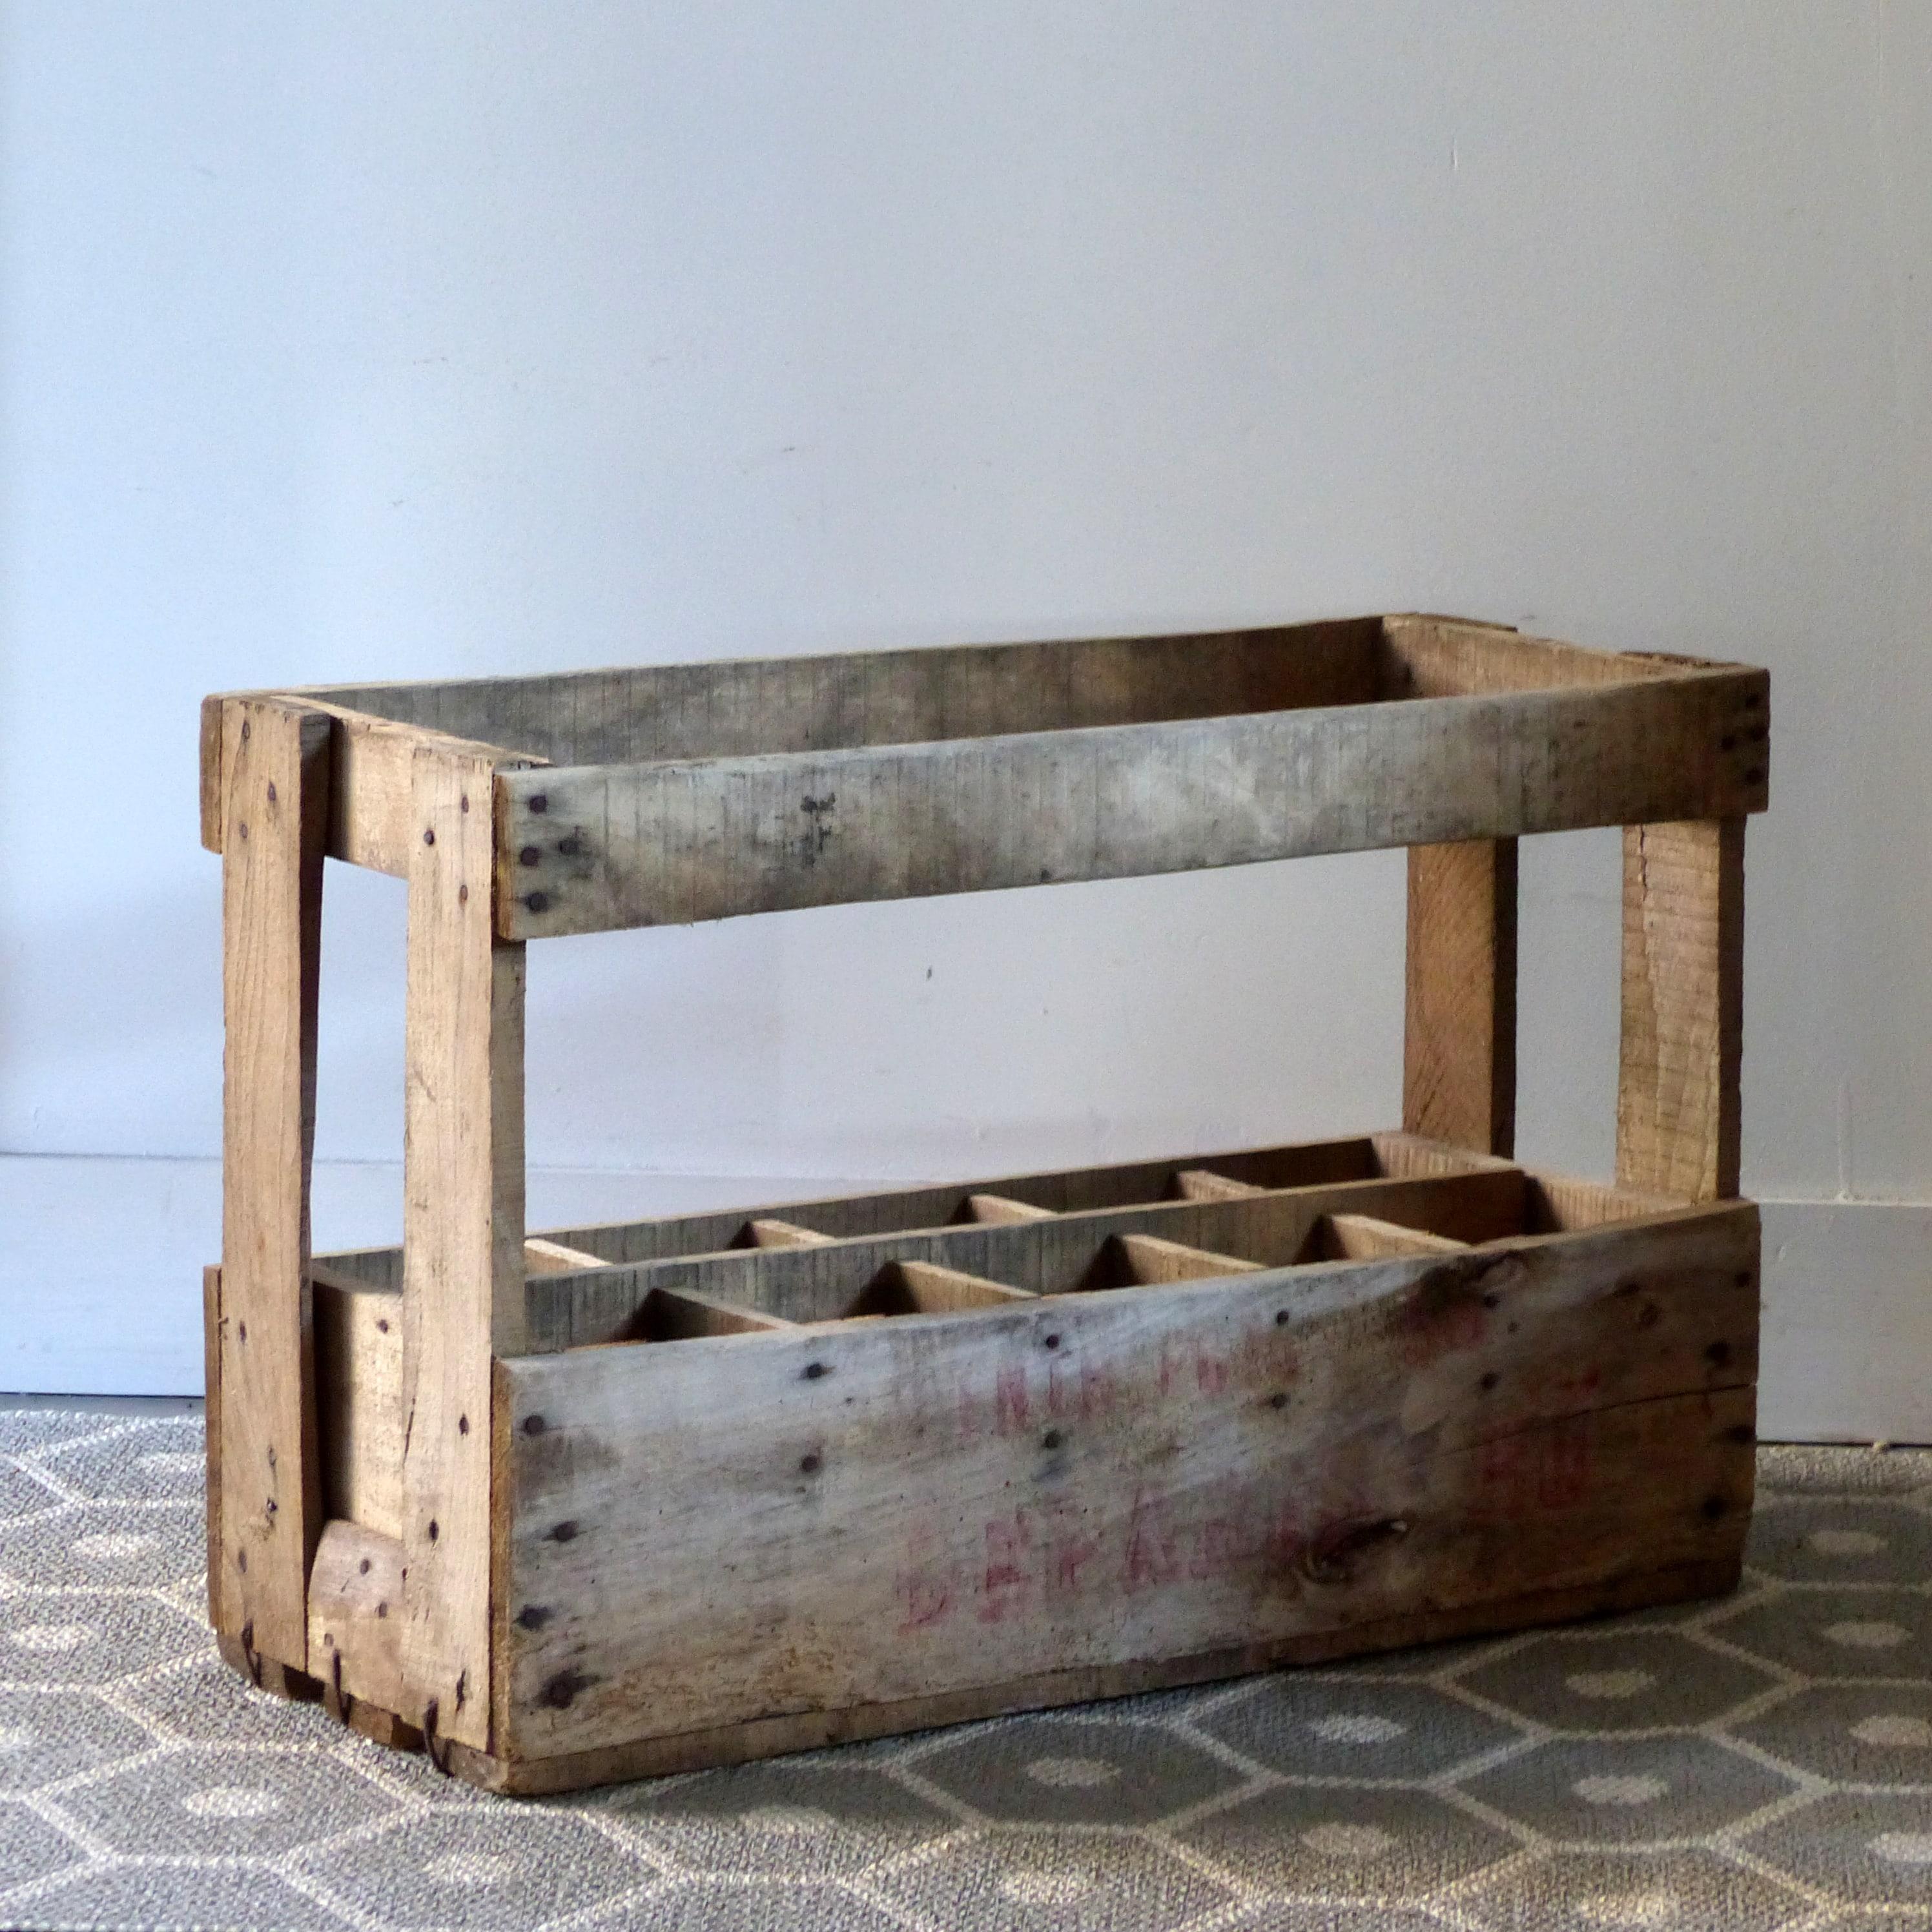 casier bouteilles en bois lignedebrocante brocante en ligne chine pour vous meubles. Black Bedroom Furniture Sets. Home Design Ideas